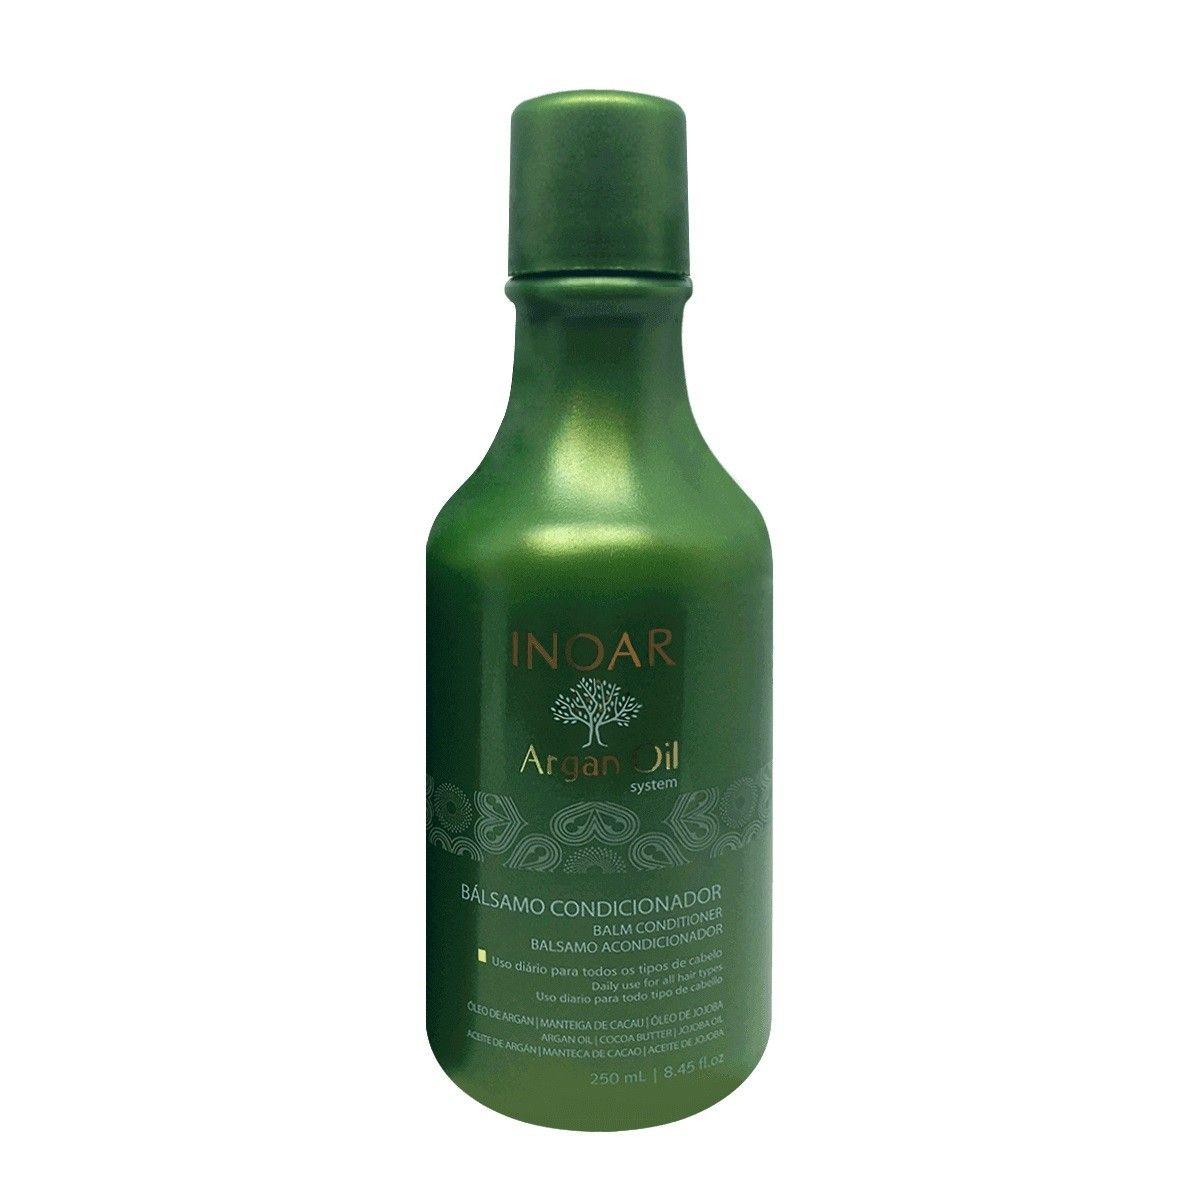 Inoar Condicionador Bálsamo Argan Oil System - 250ml